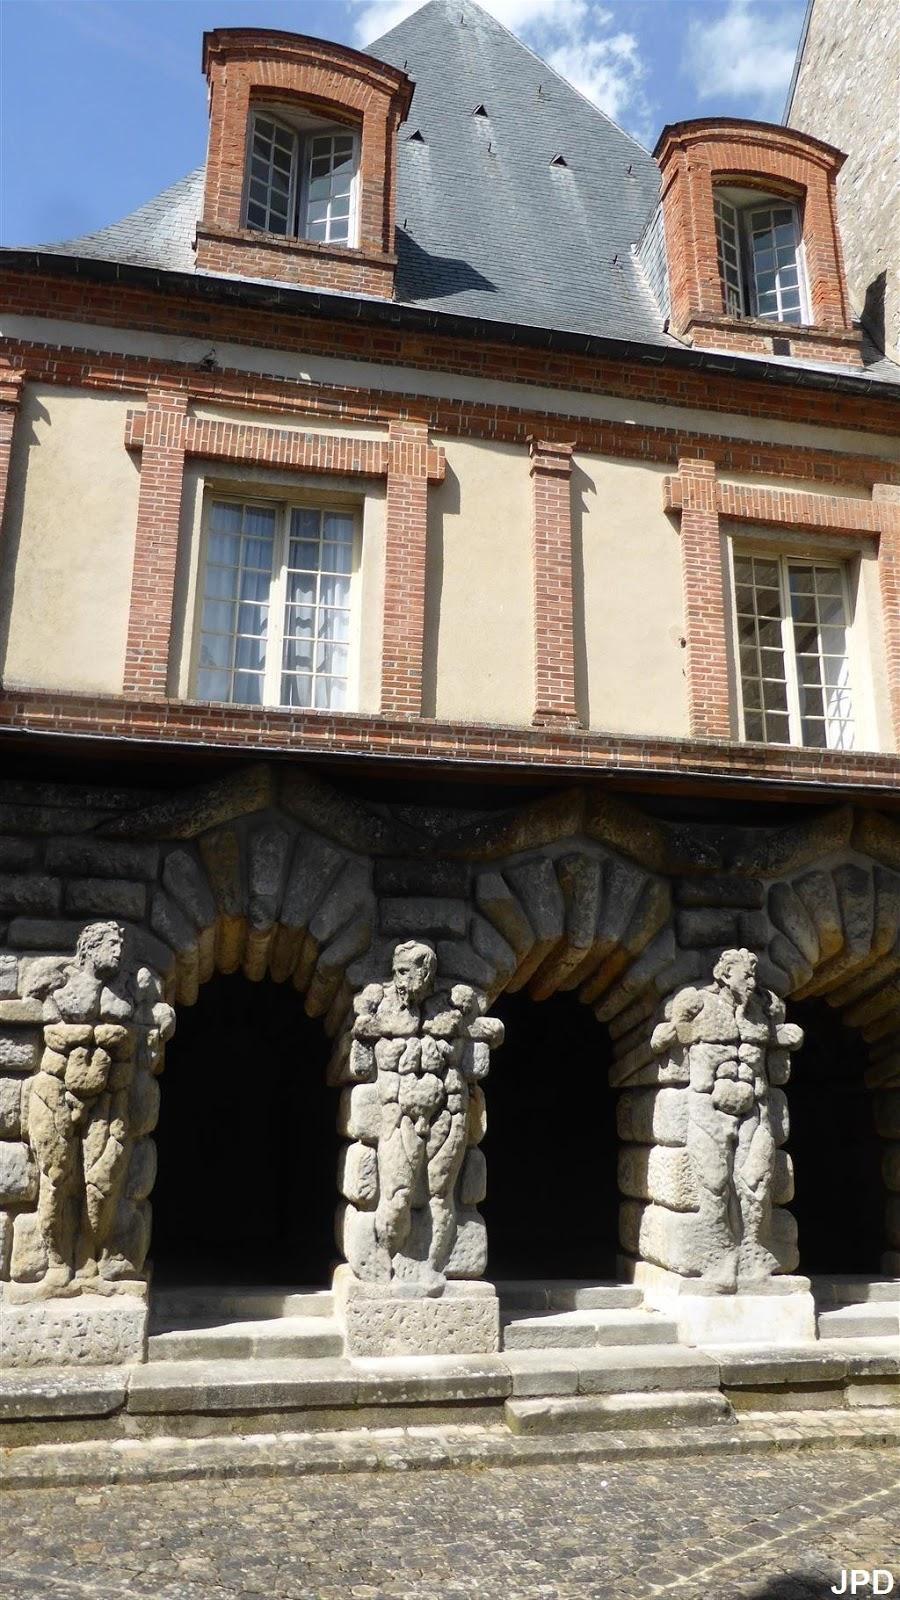 Paris bise art ch teau de fontainebleau 11 le jardin - Jardin d ulysse uk ...